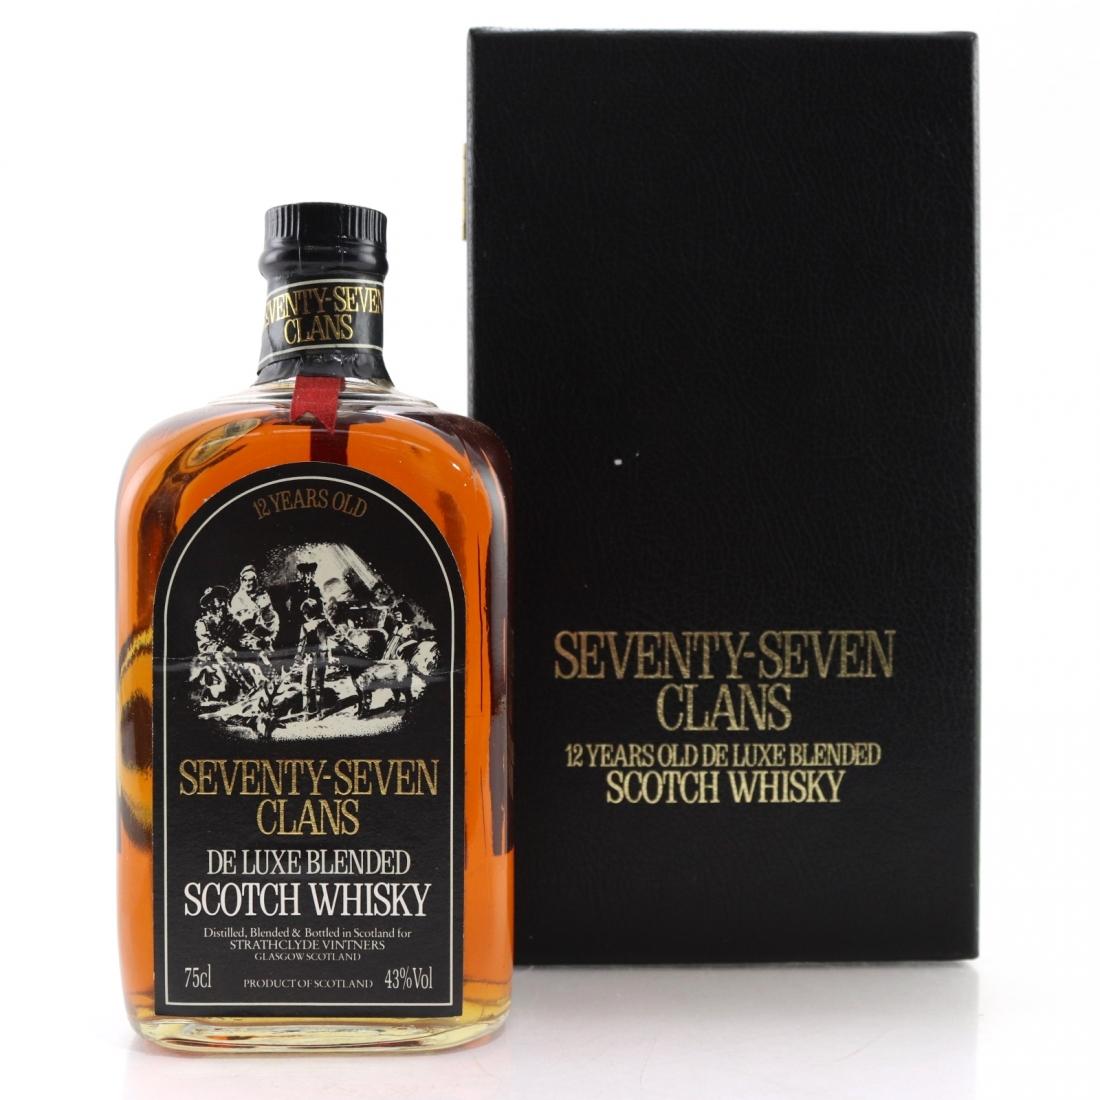 Seventy Seven Clans 12 Year Old Scotch Whisky 1980s